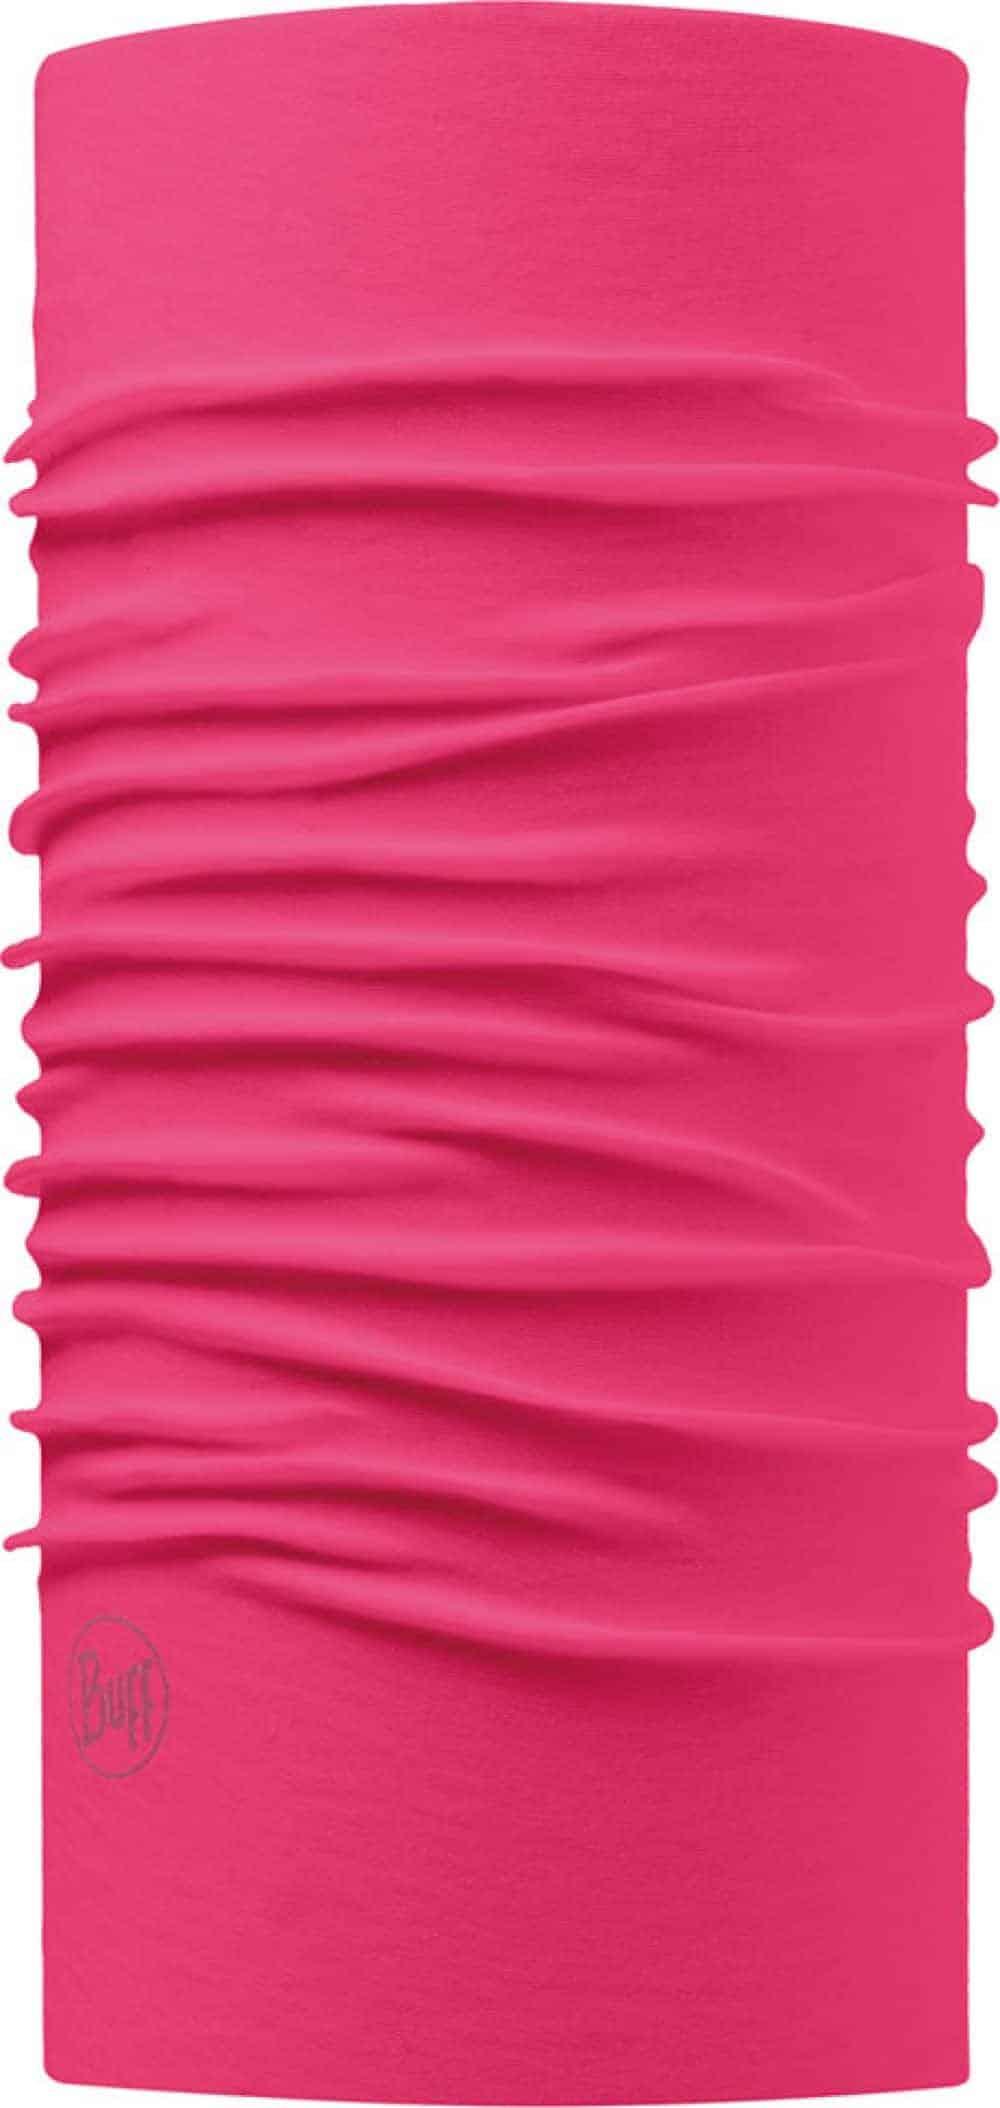 "Studio photo of Original Buff® design ""Pink Honeysuckle"". Source: buff.eu"